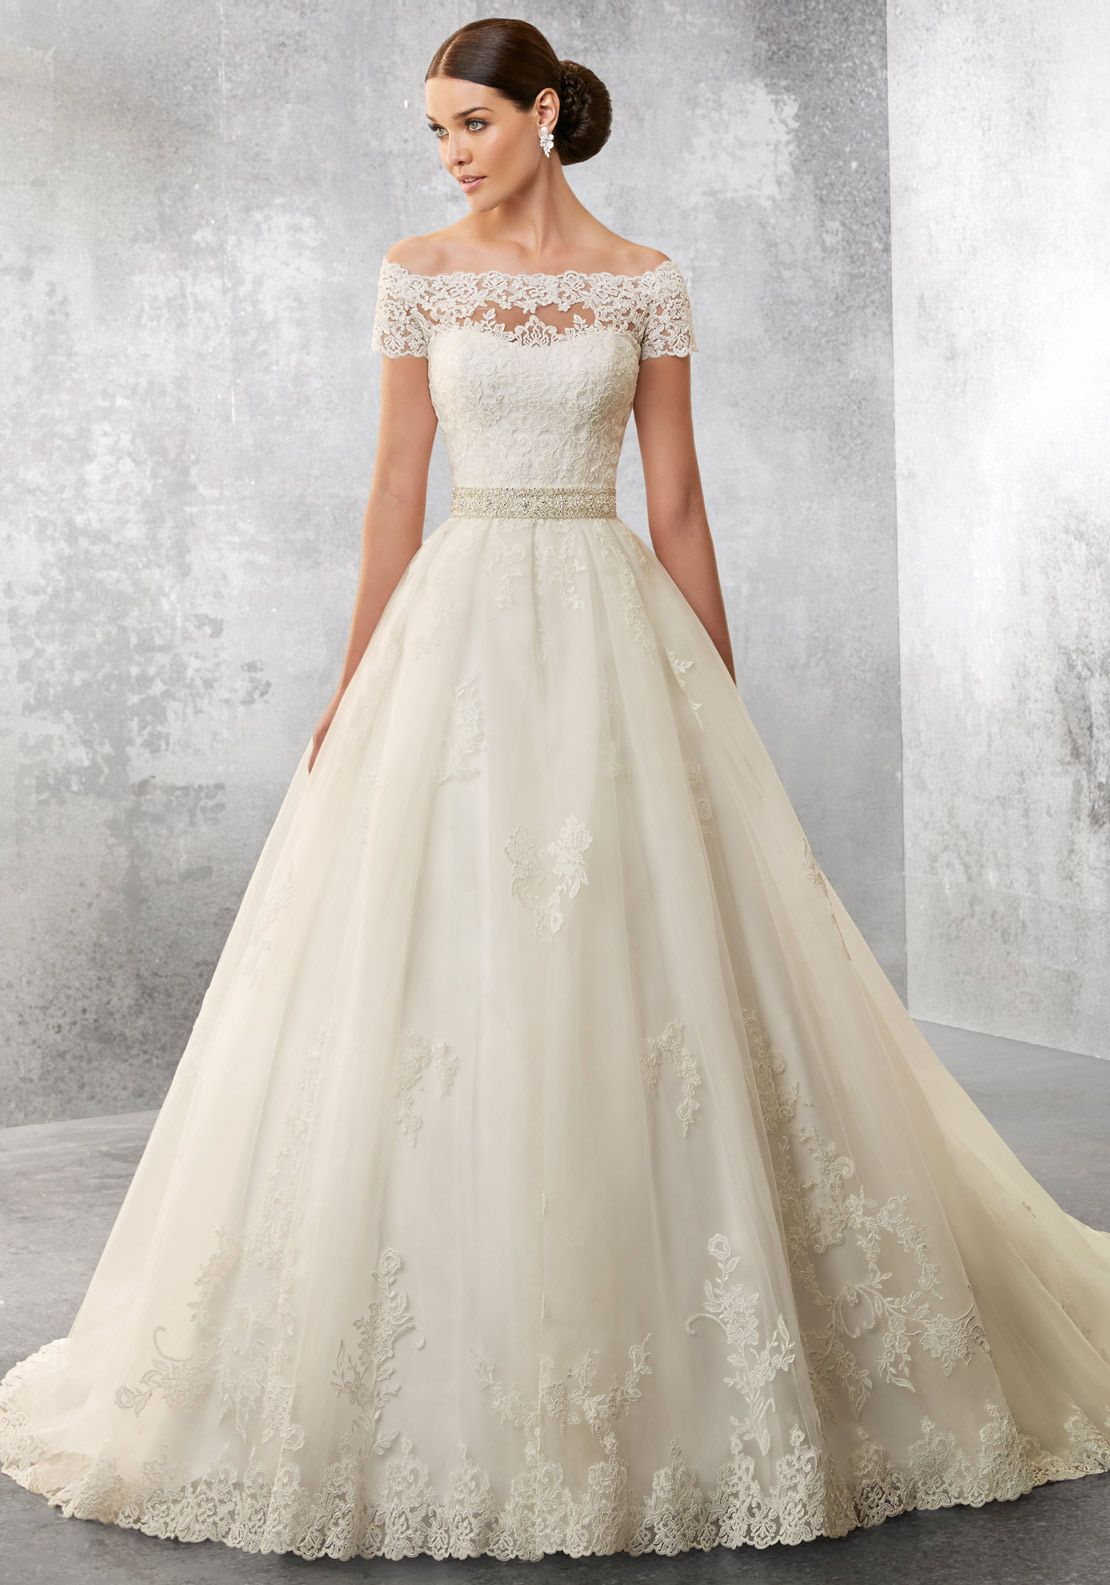 Ronald joyce wedding dress wedding pinterest ronald